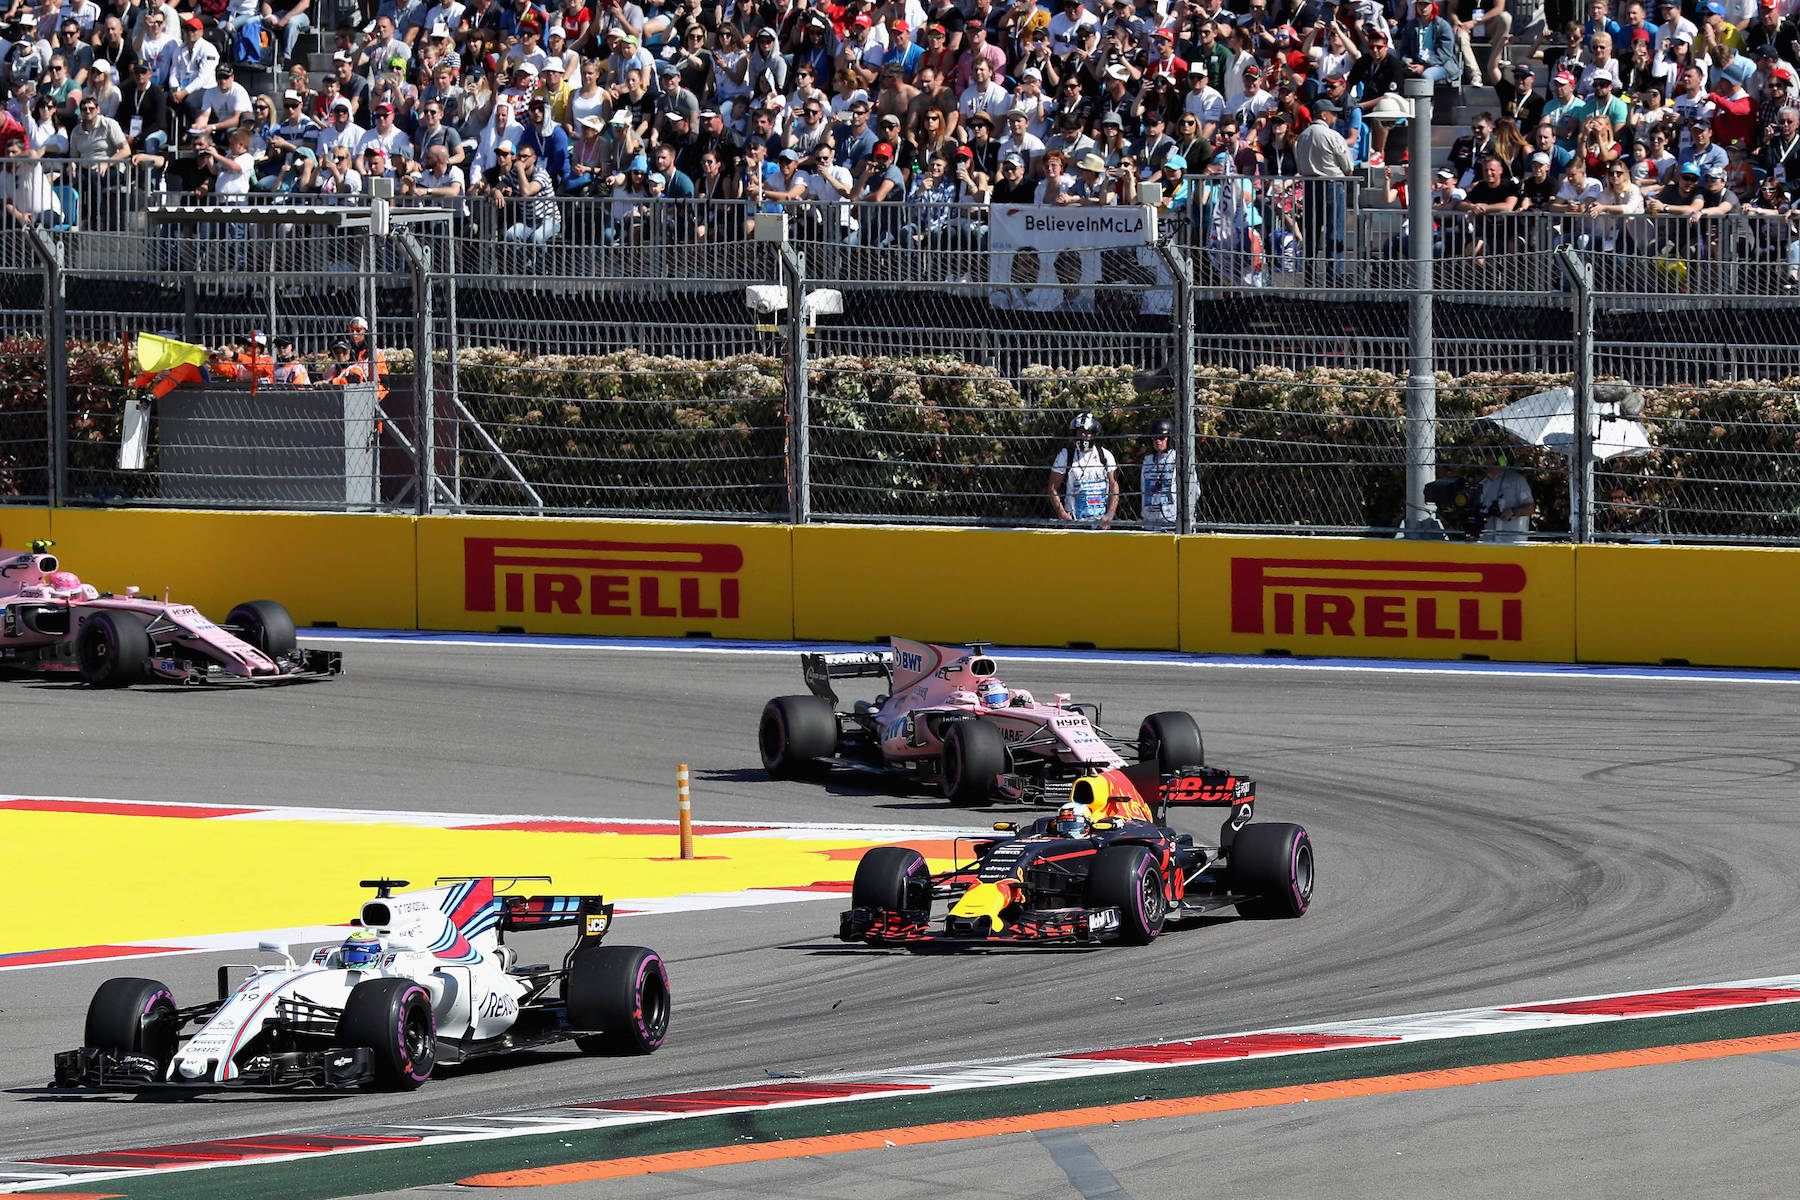 D 2017 Felipe Massa | Williams FW40 | 2017 Russian GP P 1 copy.jpg